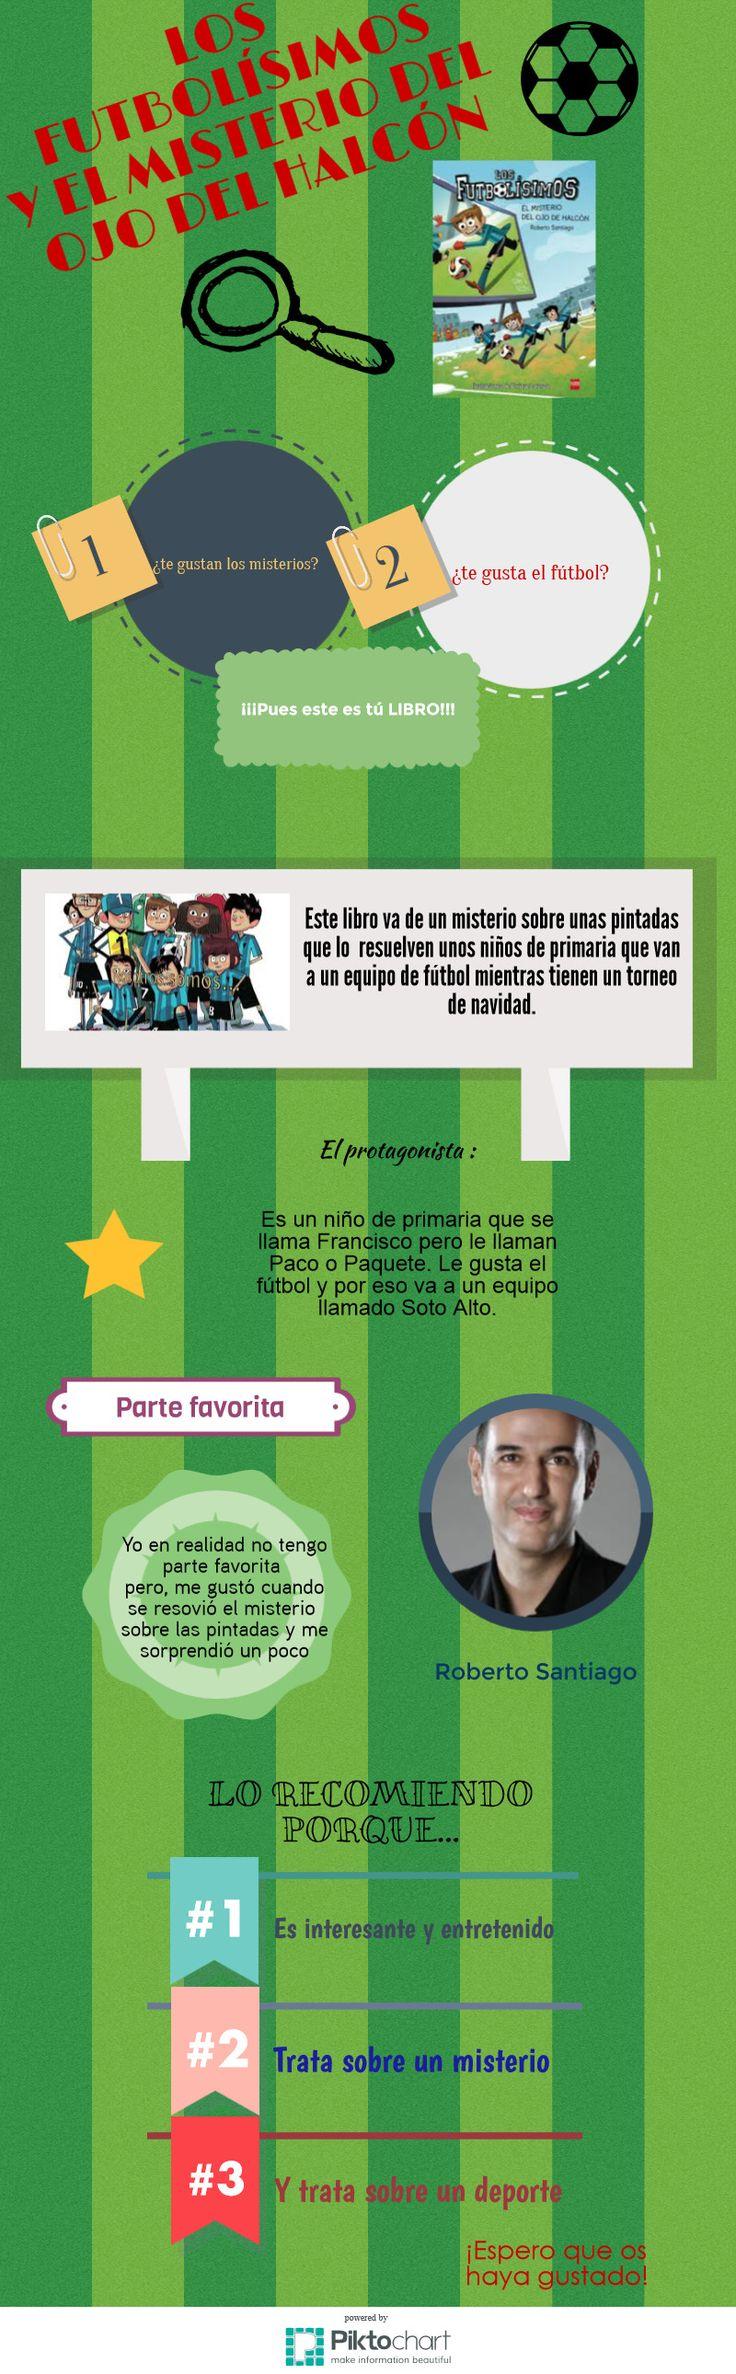 Infolectura, Los futbolísimos, por Mireia